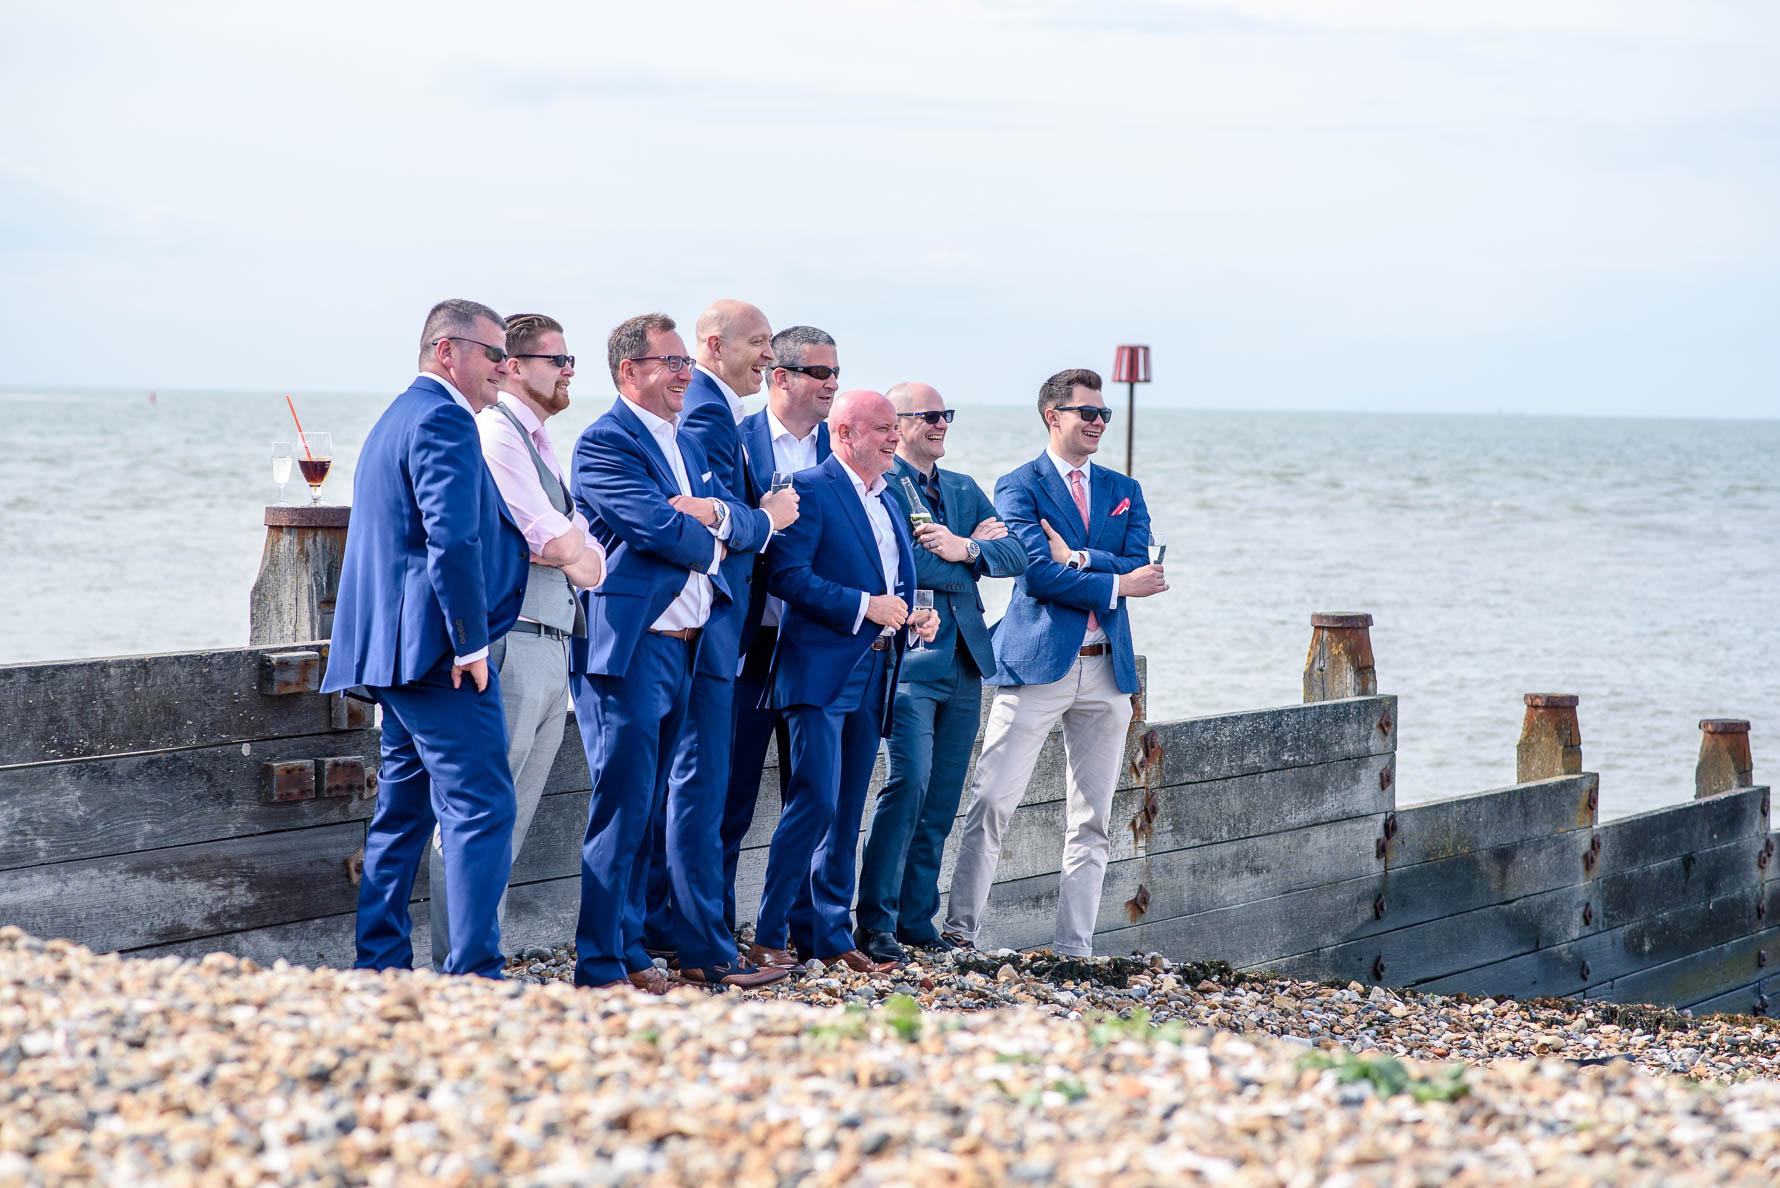 Wedding Photography at East Quay Venue-49.jpg